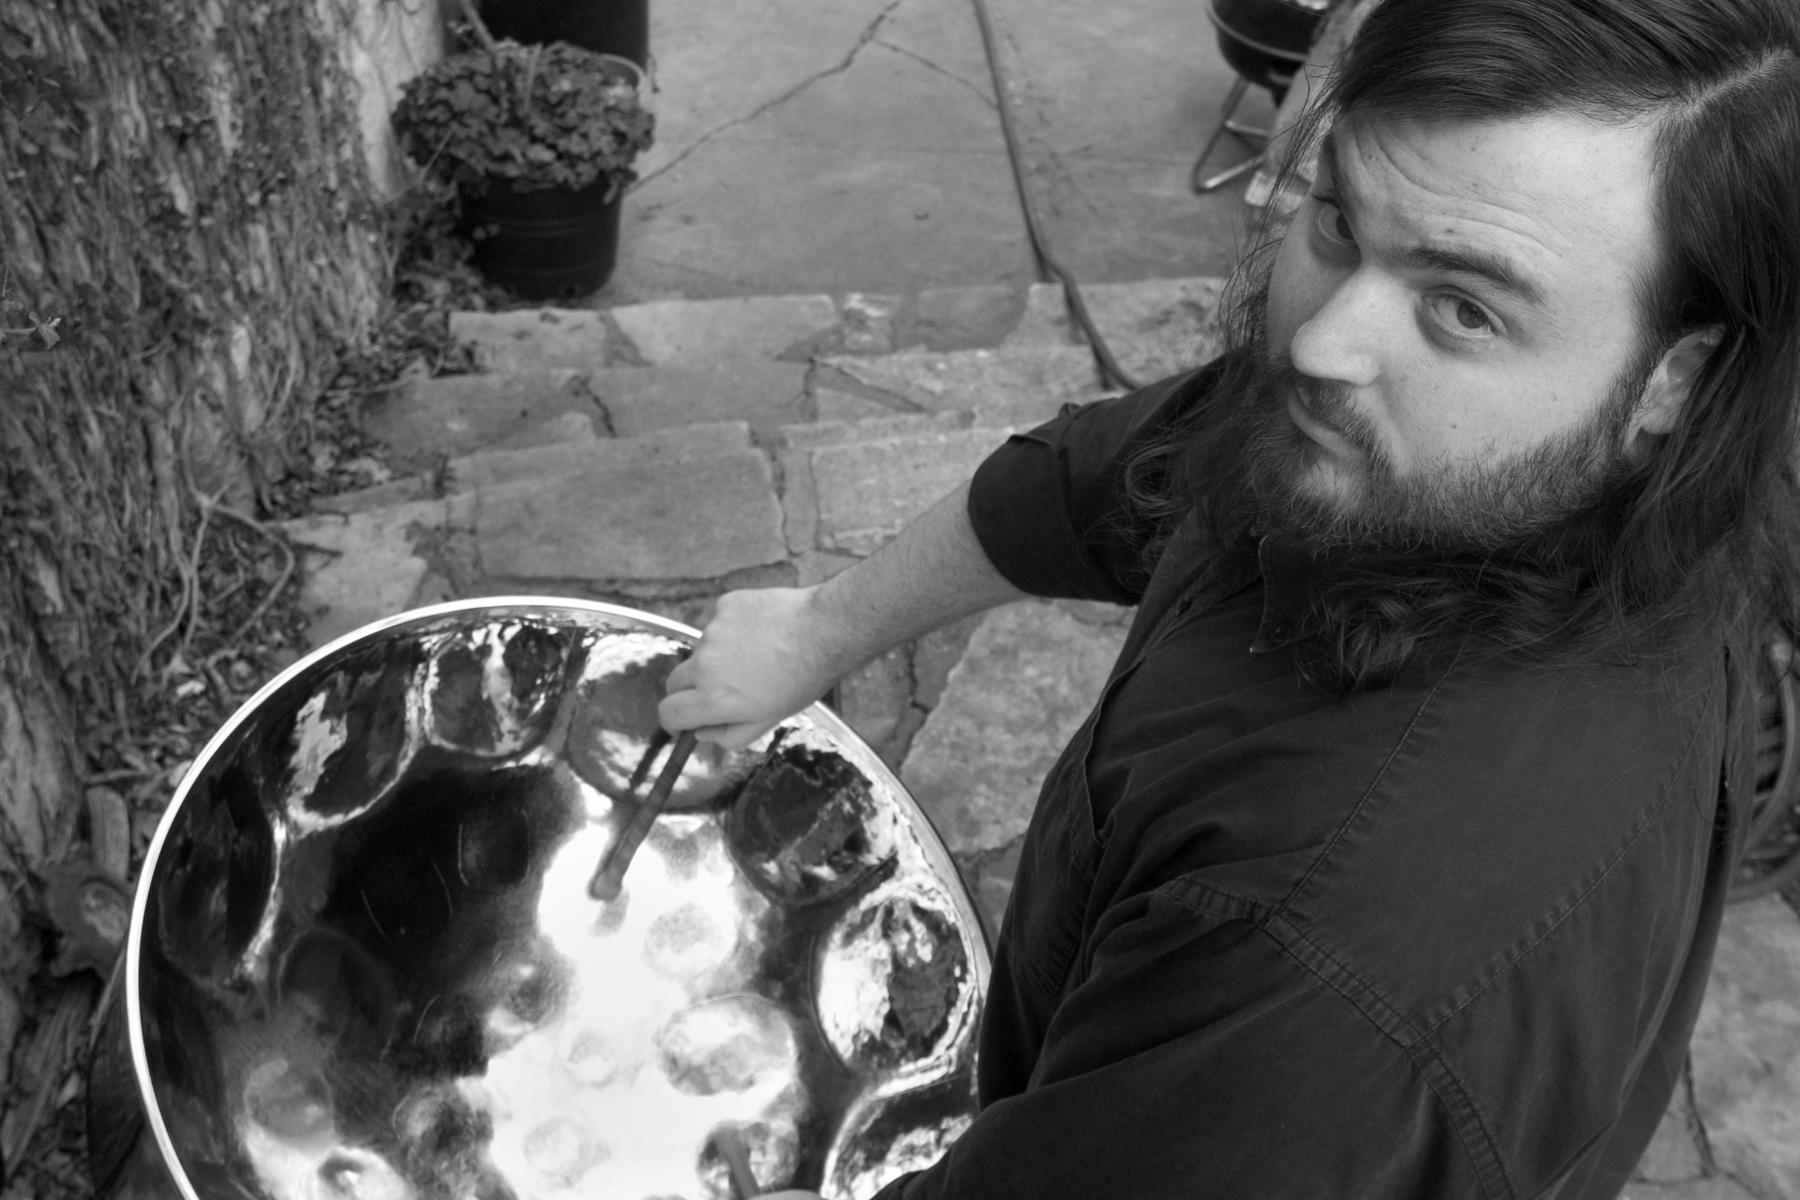 Aaron Lack on steelpan